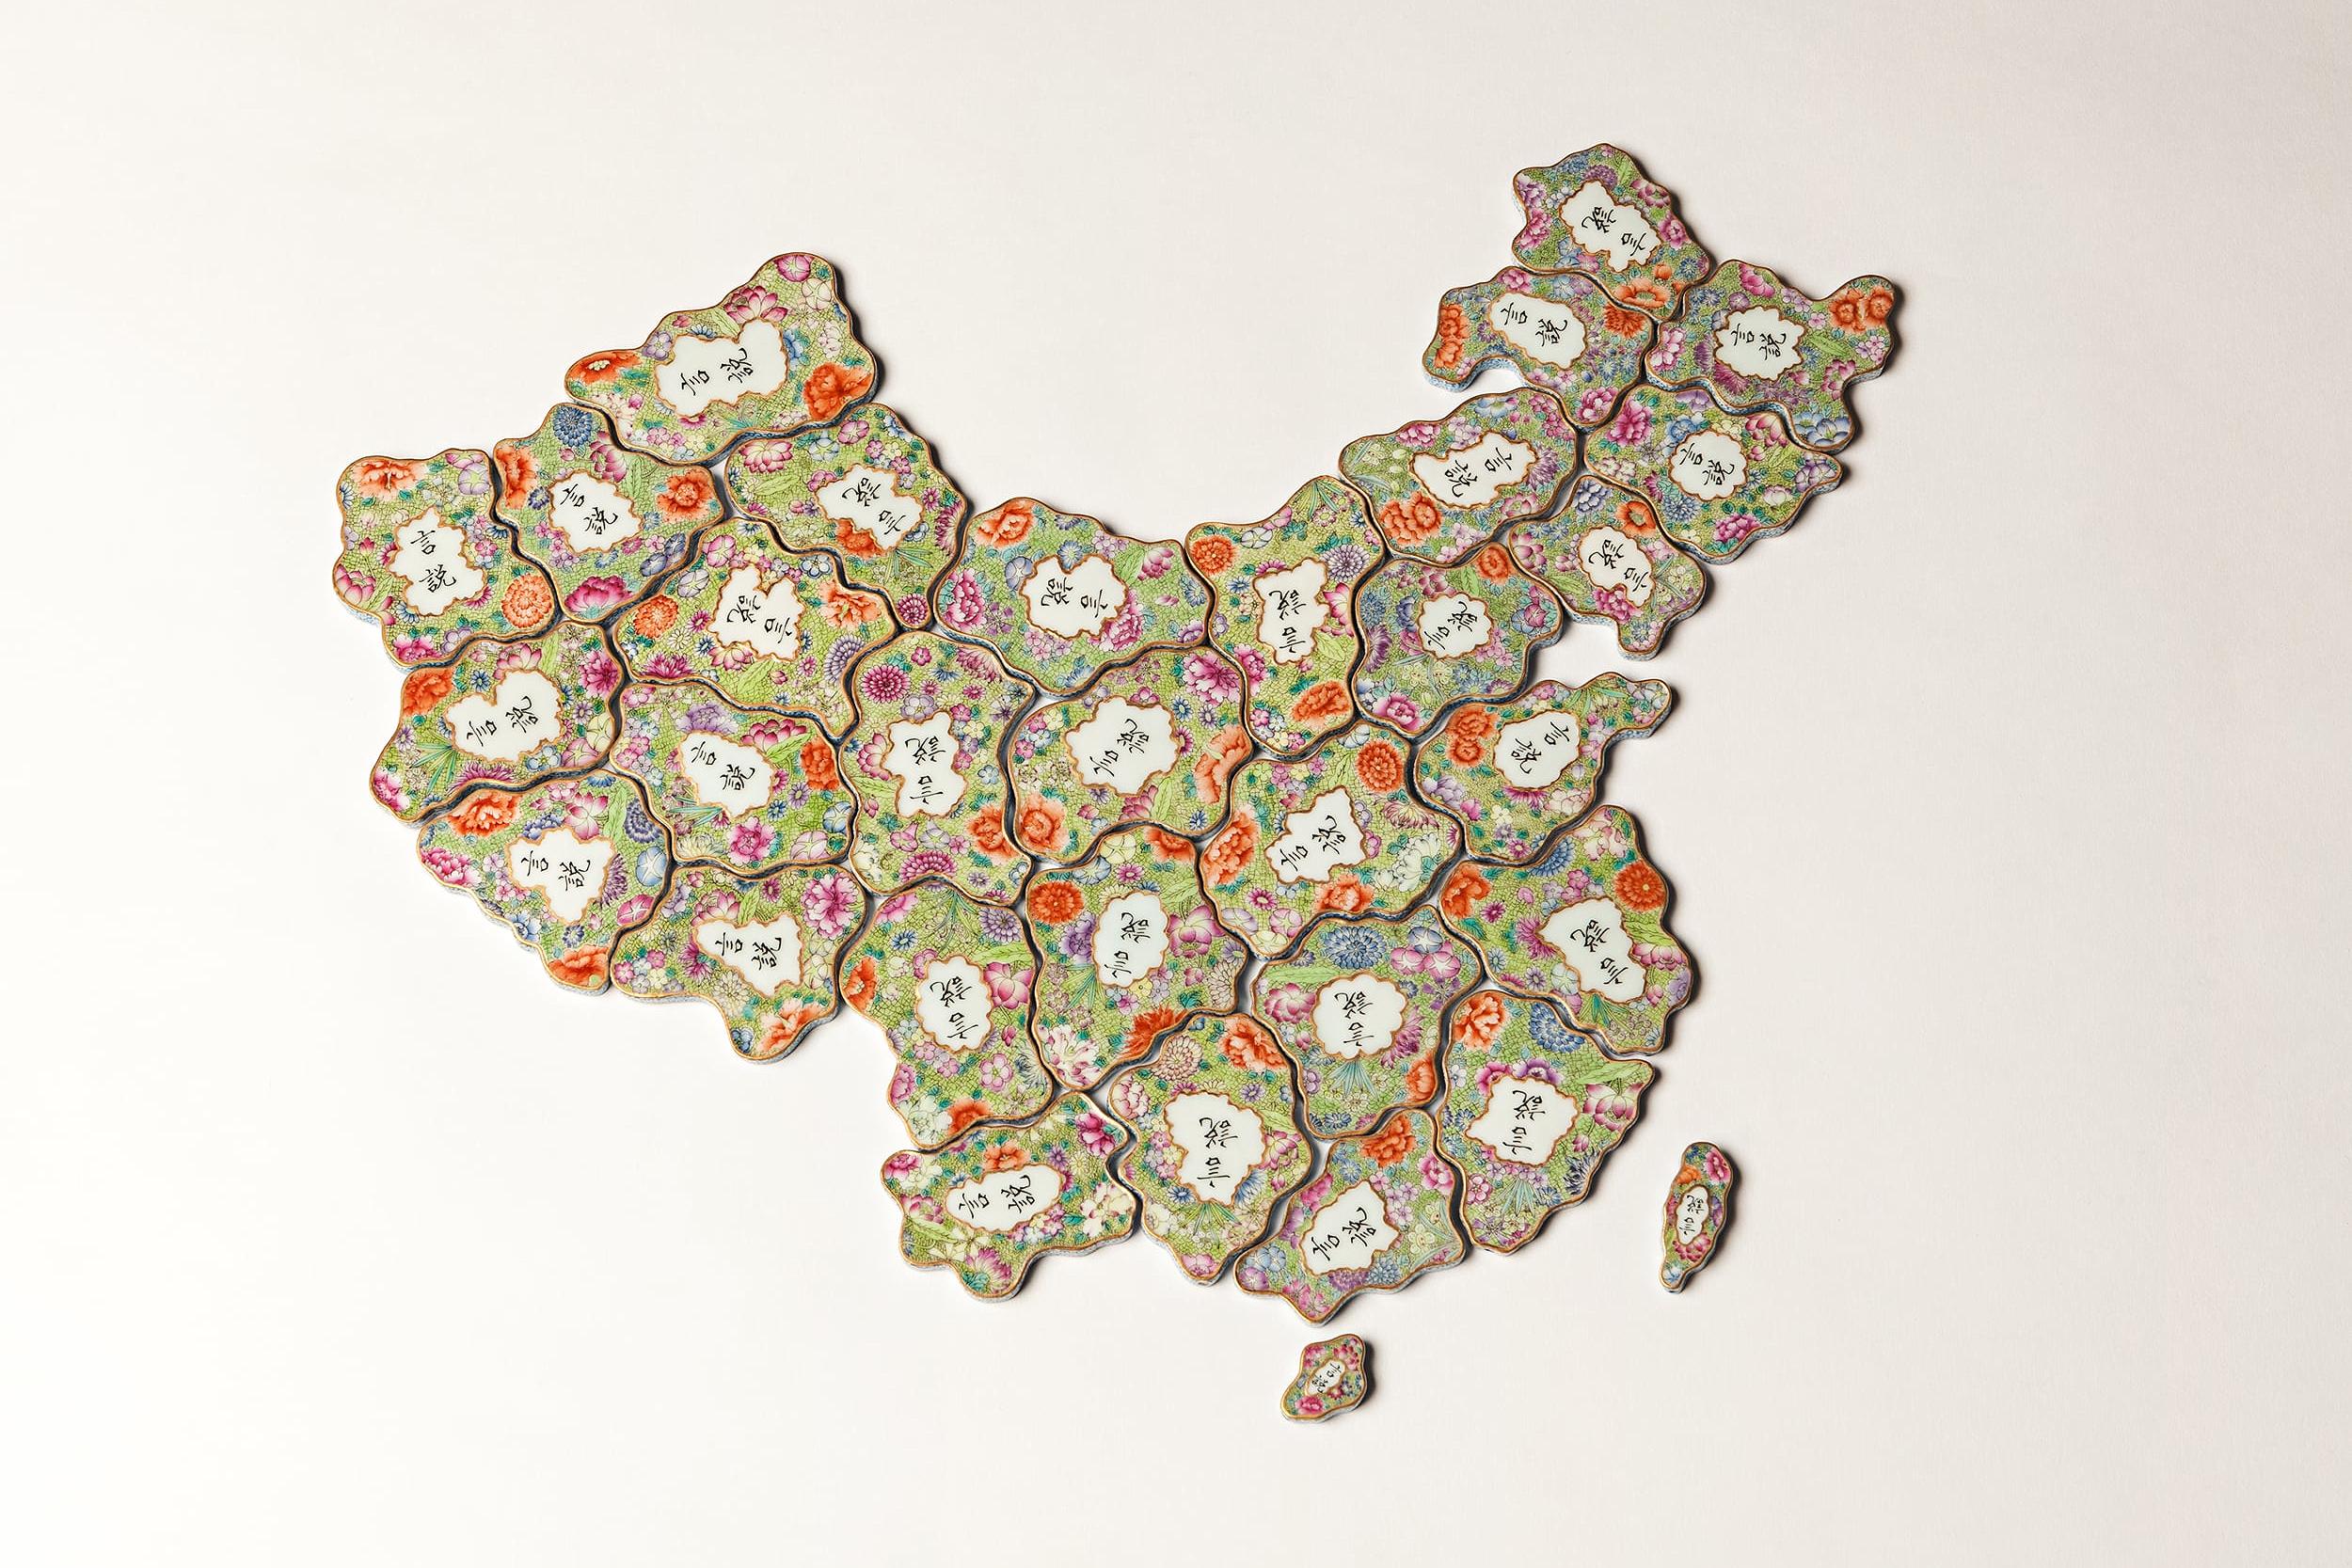 Free Speech Puzzle, 2014 - 51 x 41 x 0.8cm